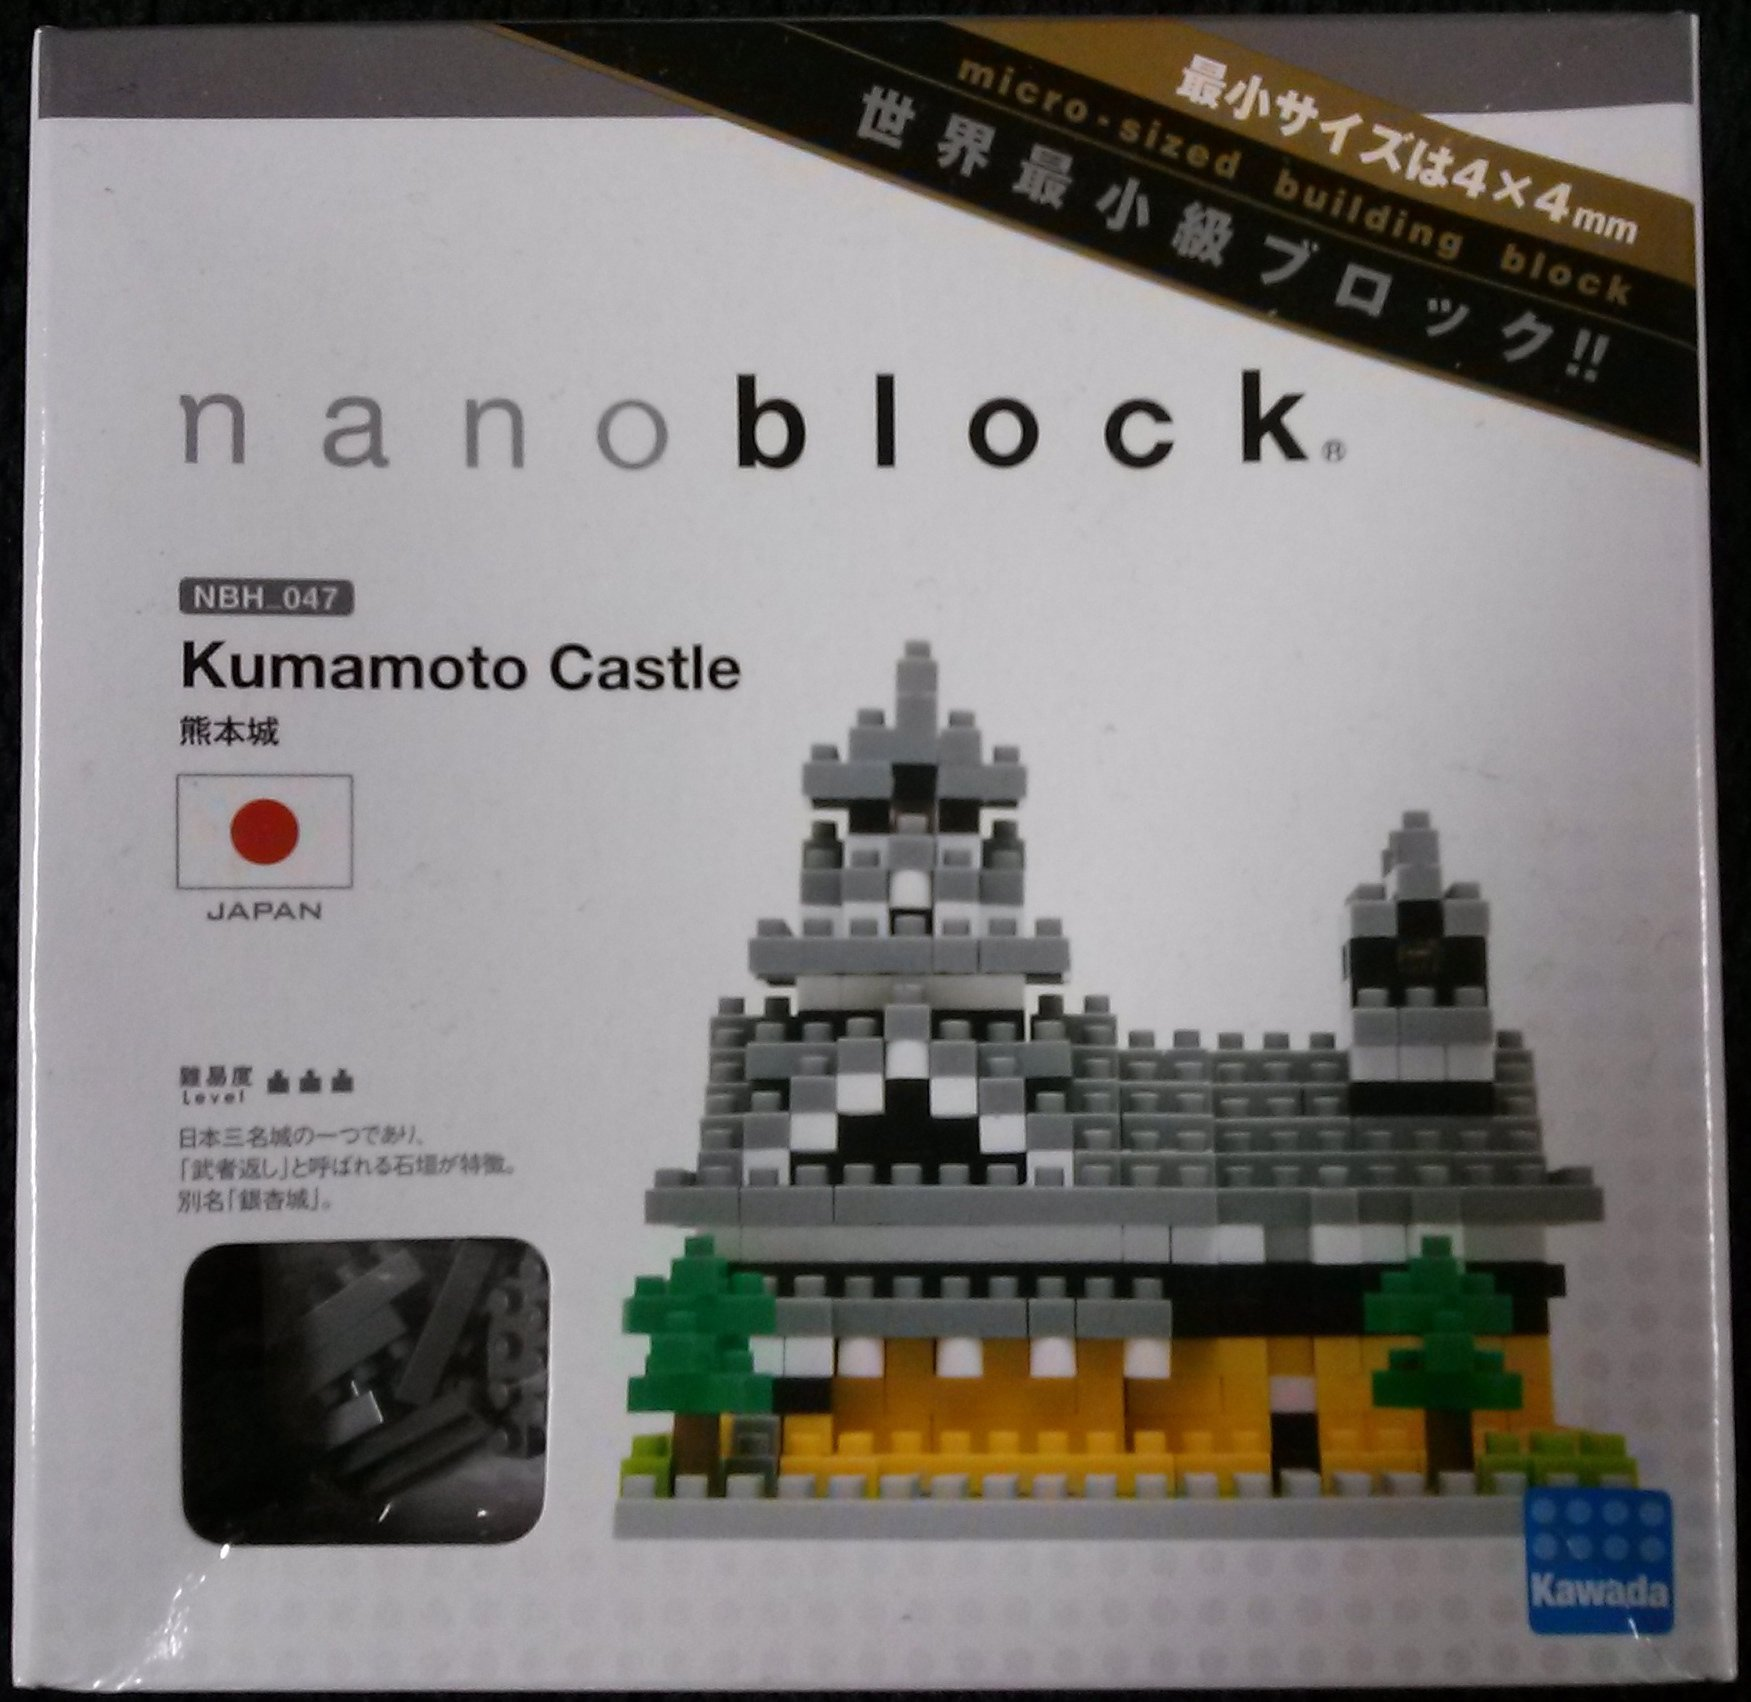 Nano block Made in Japan in Honolulu, HI